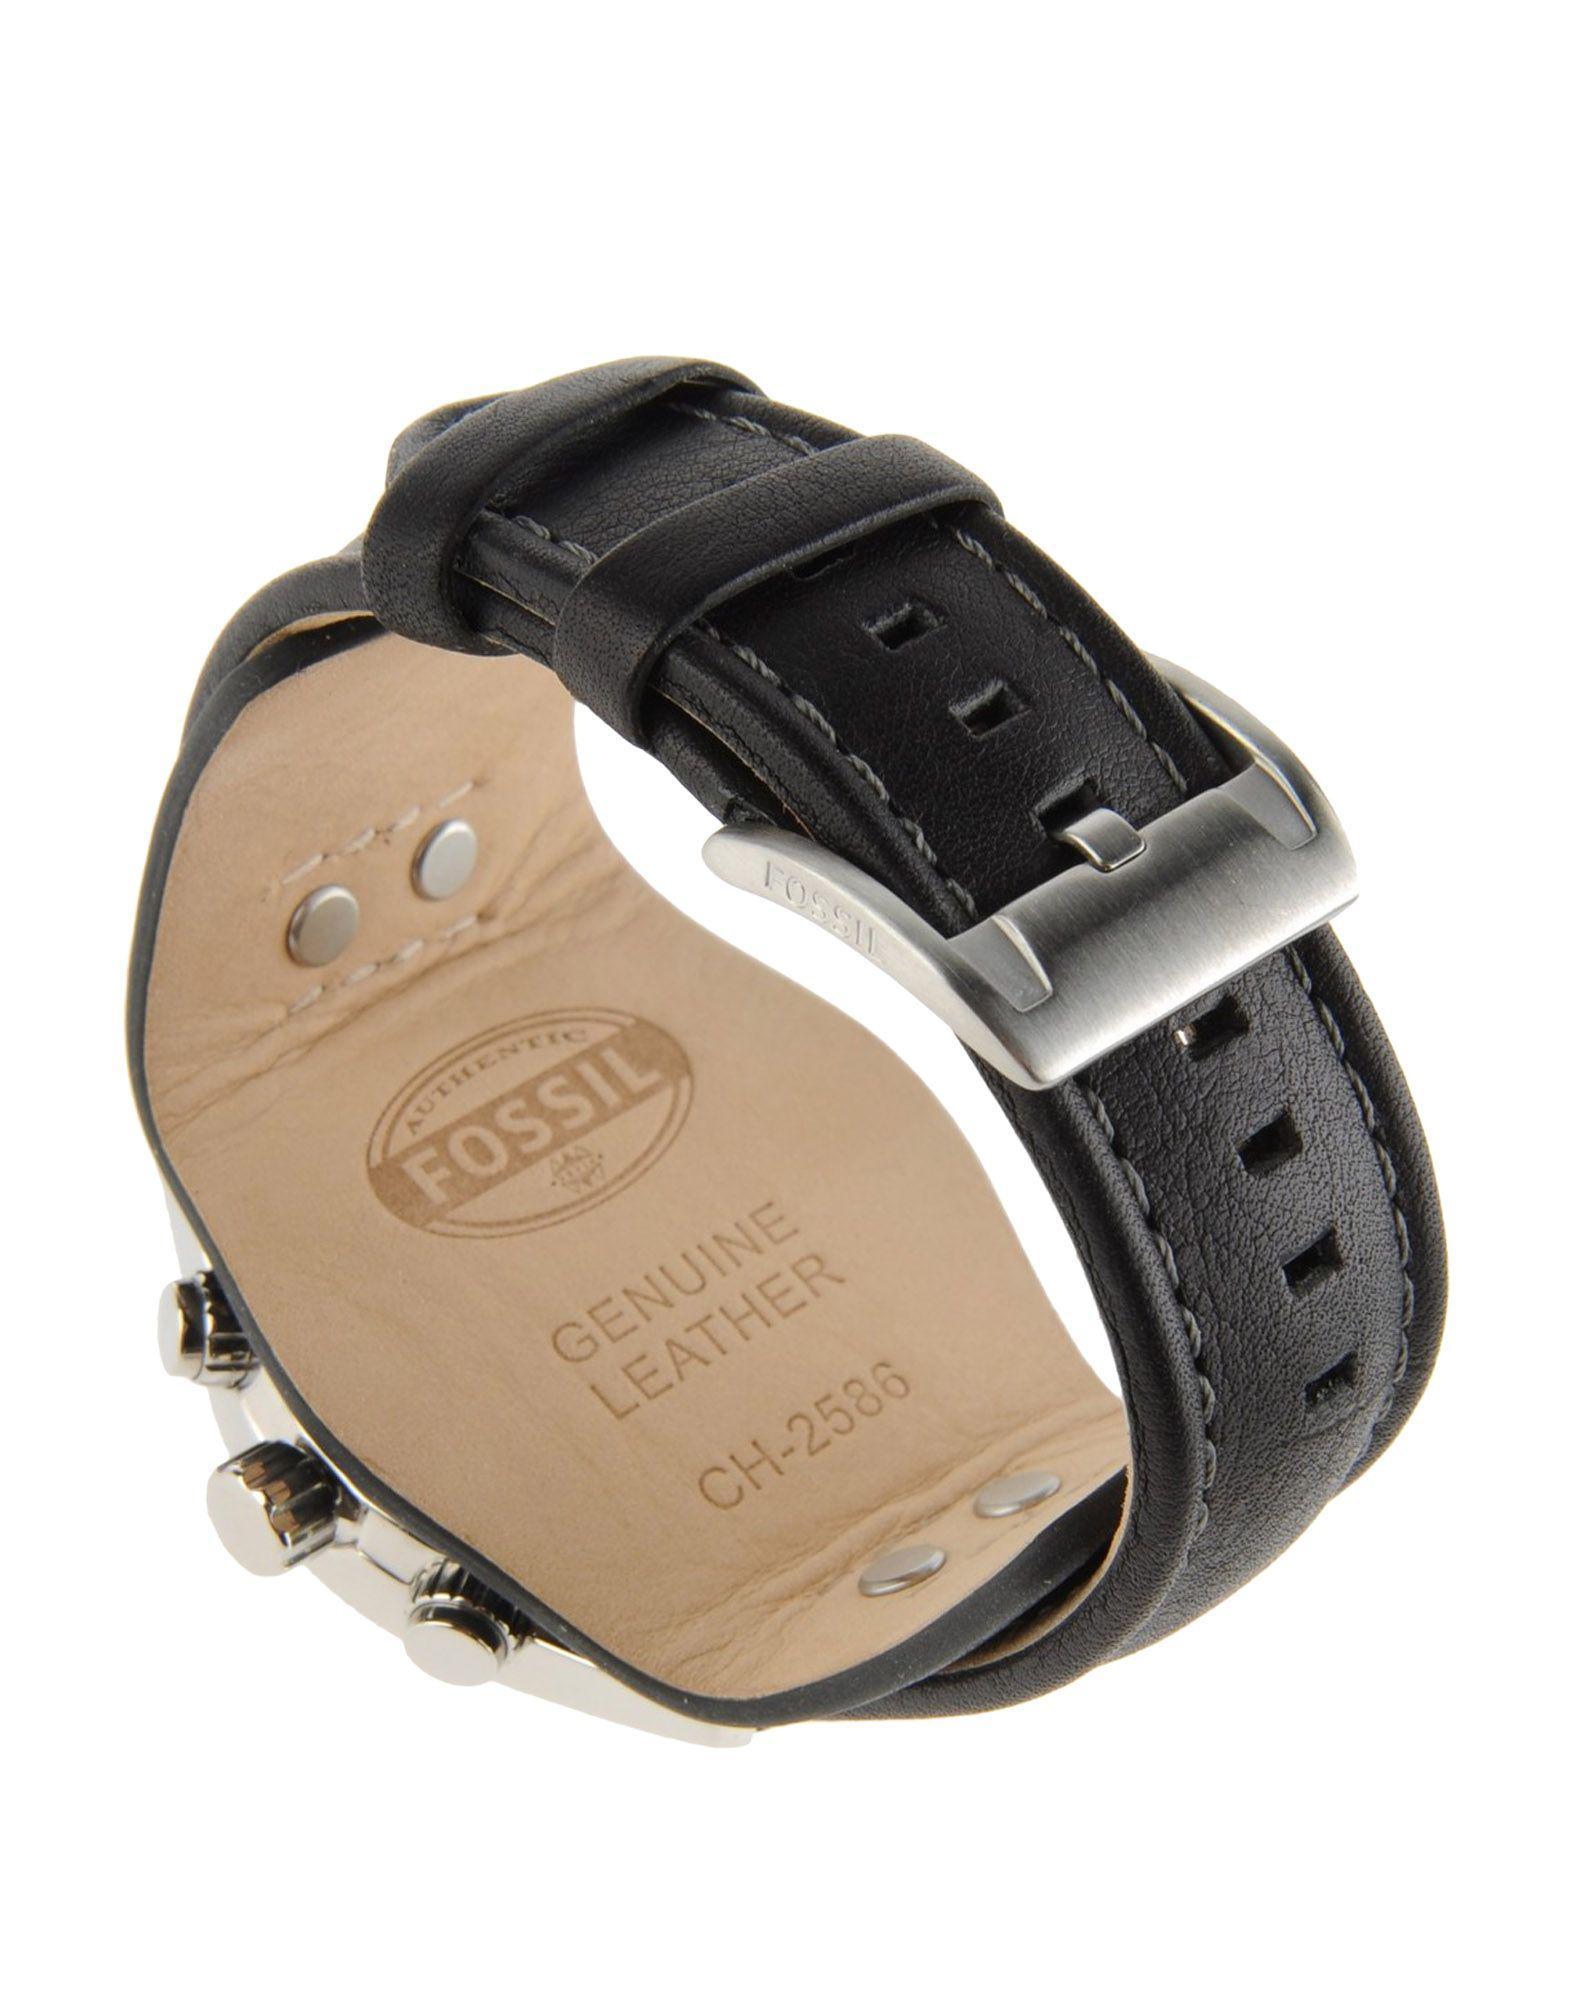 1be41aeccafb Reloj de pulsera Fossil de hombre de color Negro - Lyst